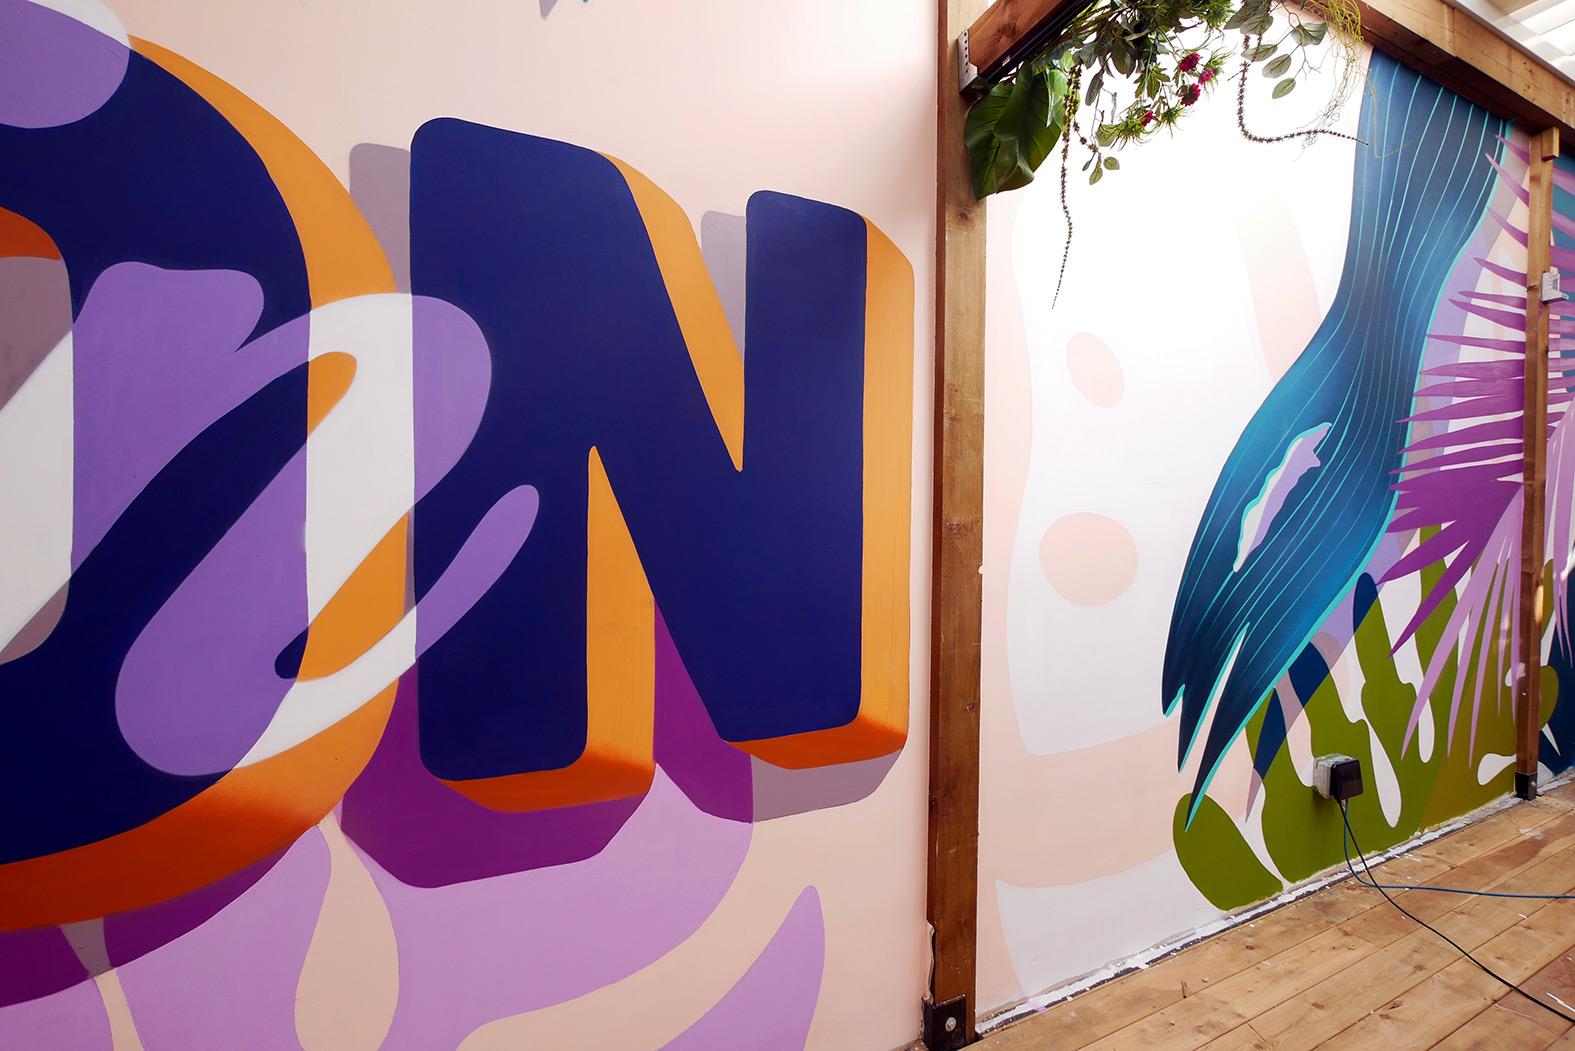 Nerone-lost-in-brixton-mural-painting-street-art-14